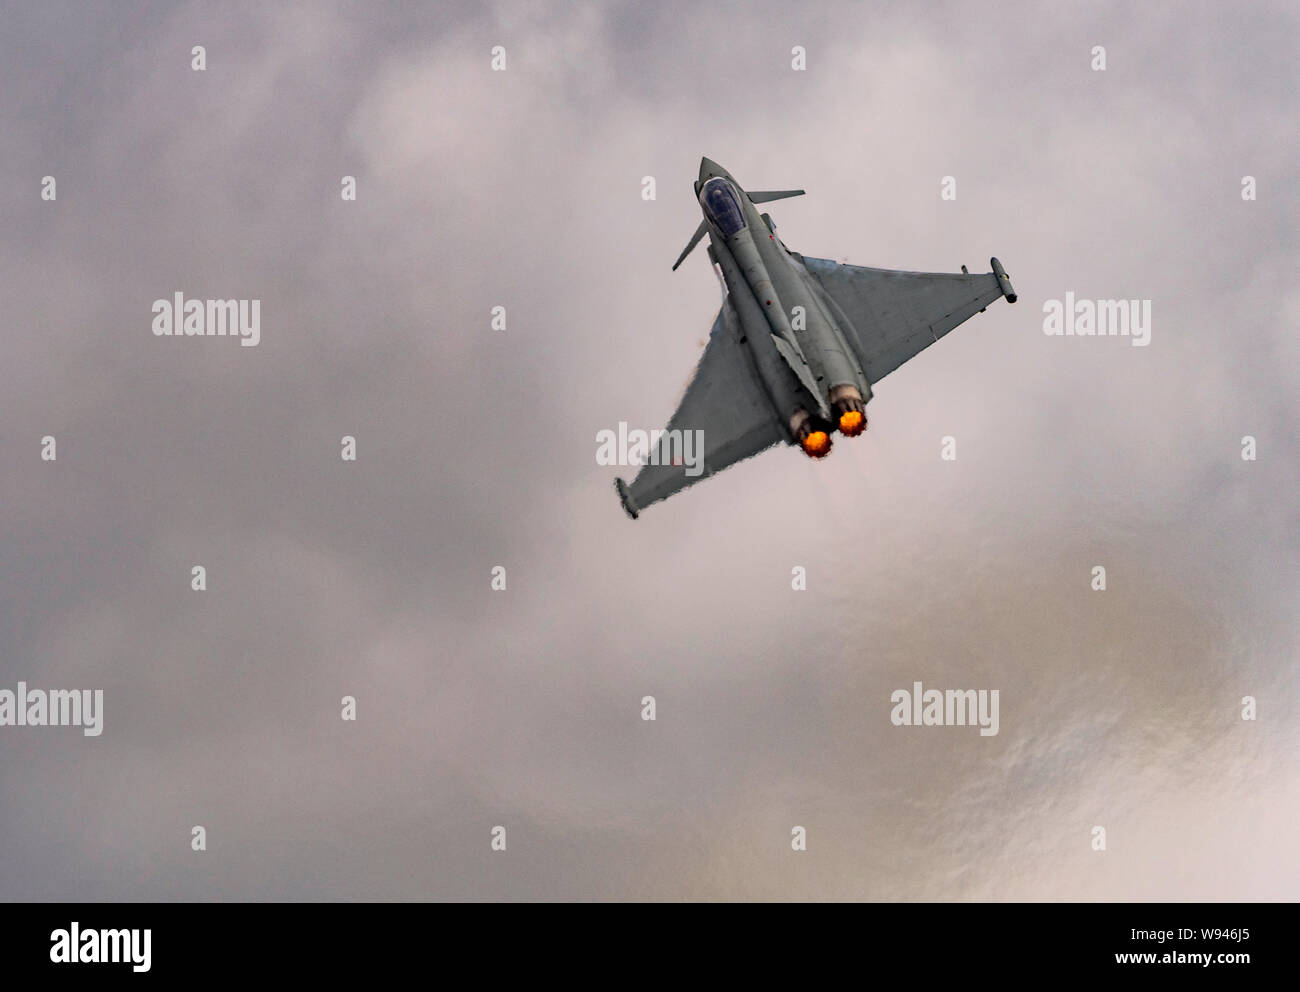 Eurofighter, F-2000 Typhoon at the Royal International Air Tattoo 2019 Stock Photo